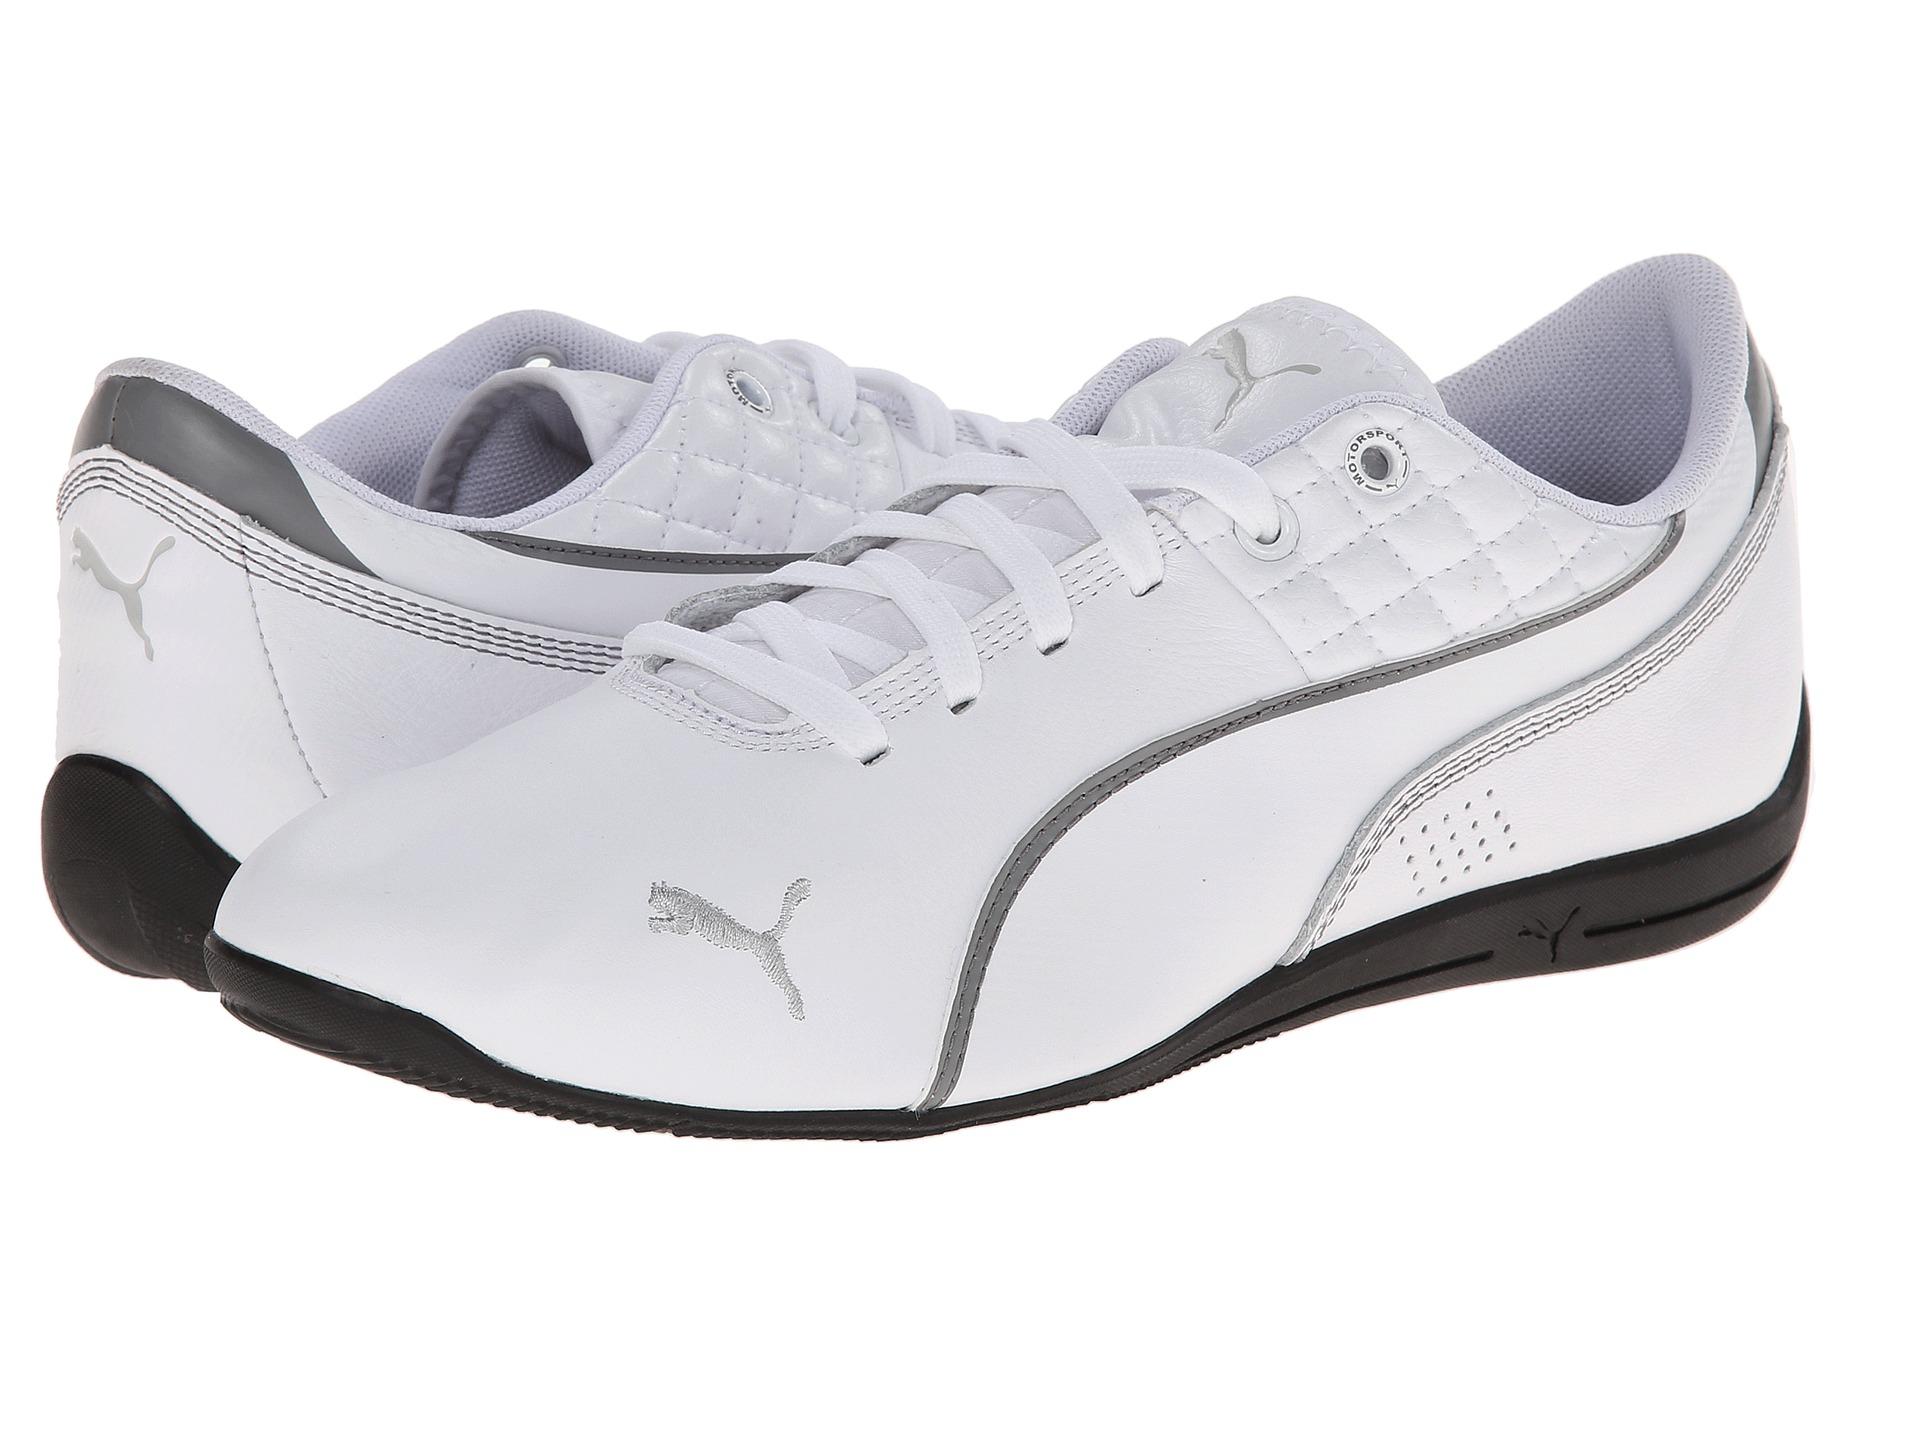 91bb95019b9839 Lyst - PUMA Drift Cat 6 Tech in White for Men